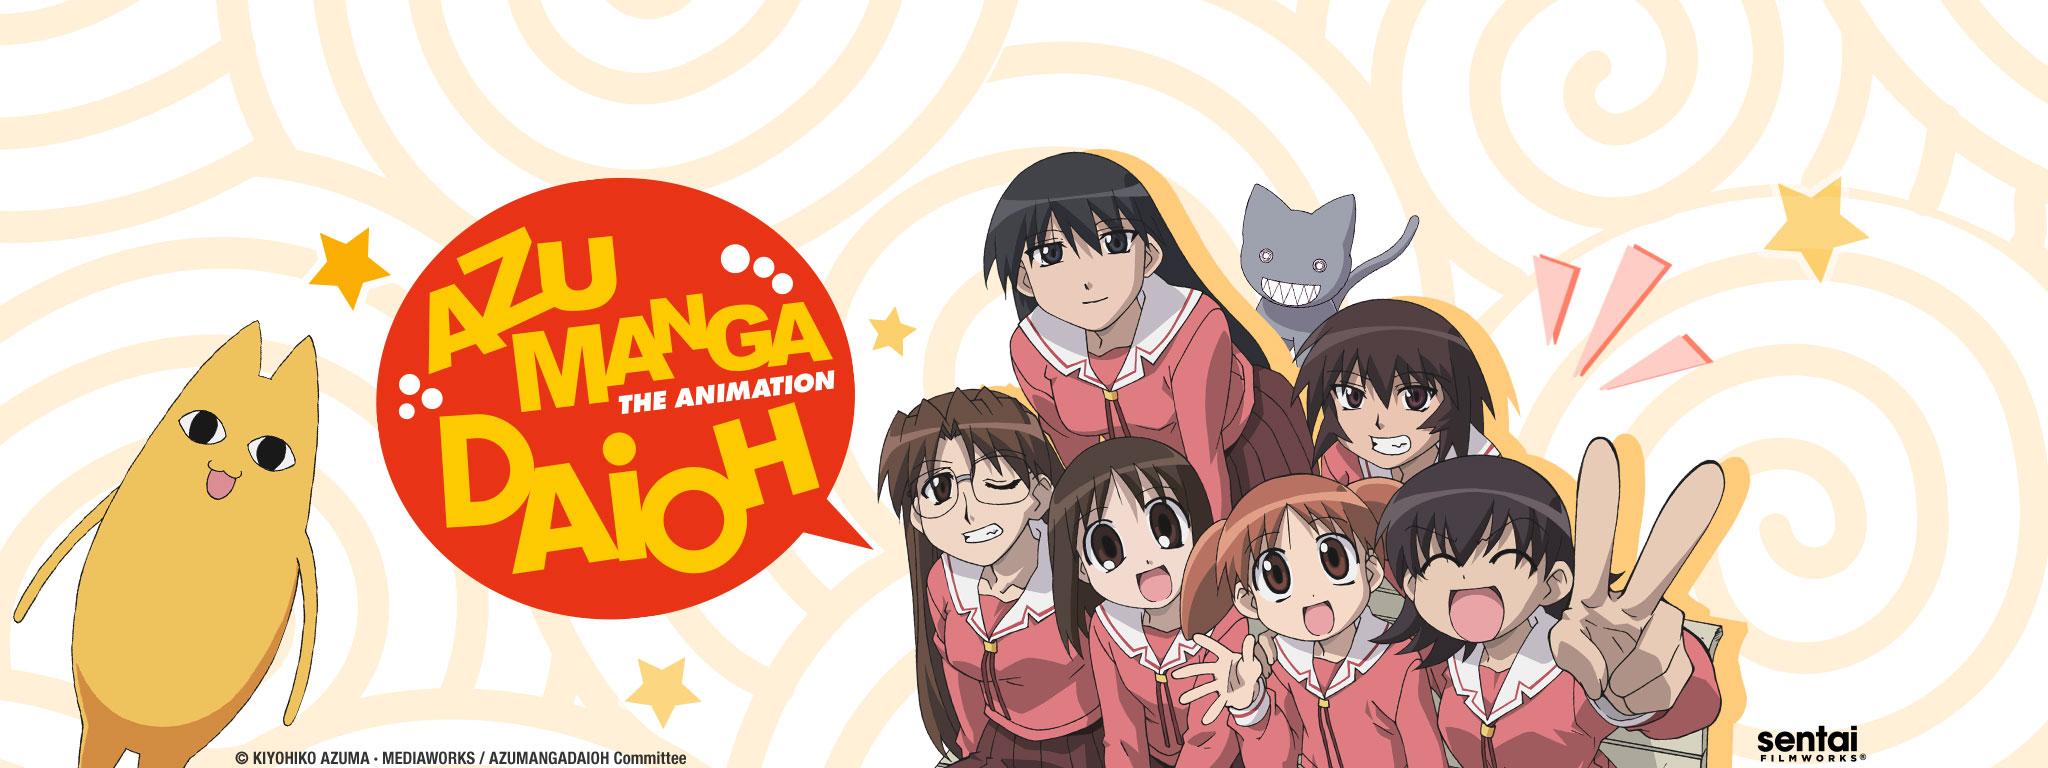 Azumanga Daioh - Sentai Filmworks